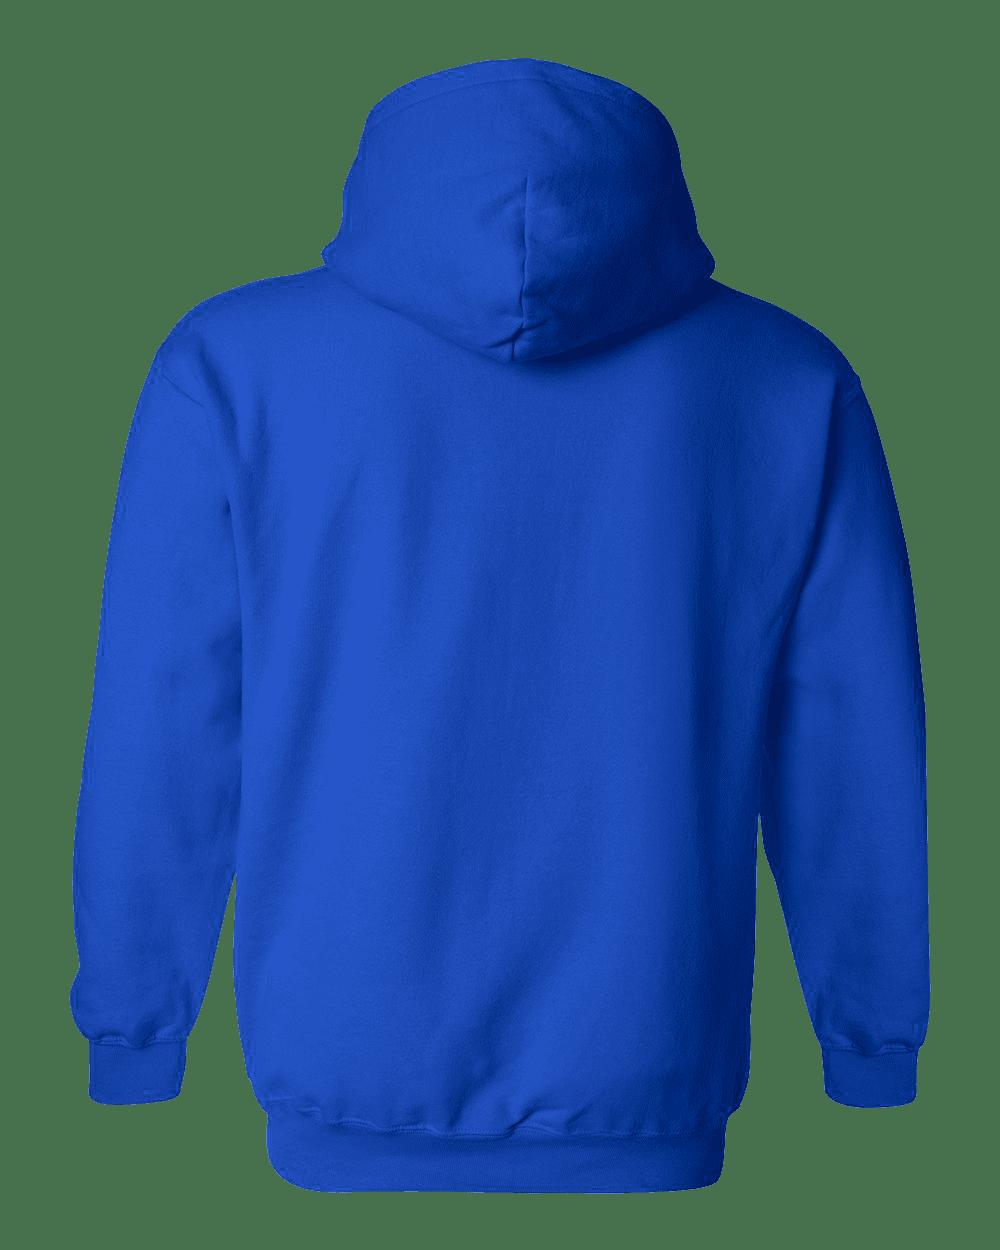 860d241baa165 6th Class Hoodies   Design 5 English - Hoodies.irish - Sixth Class ...